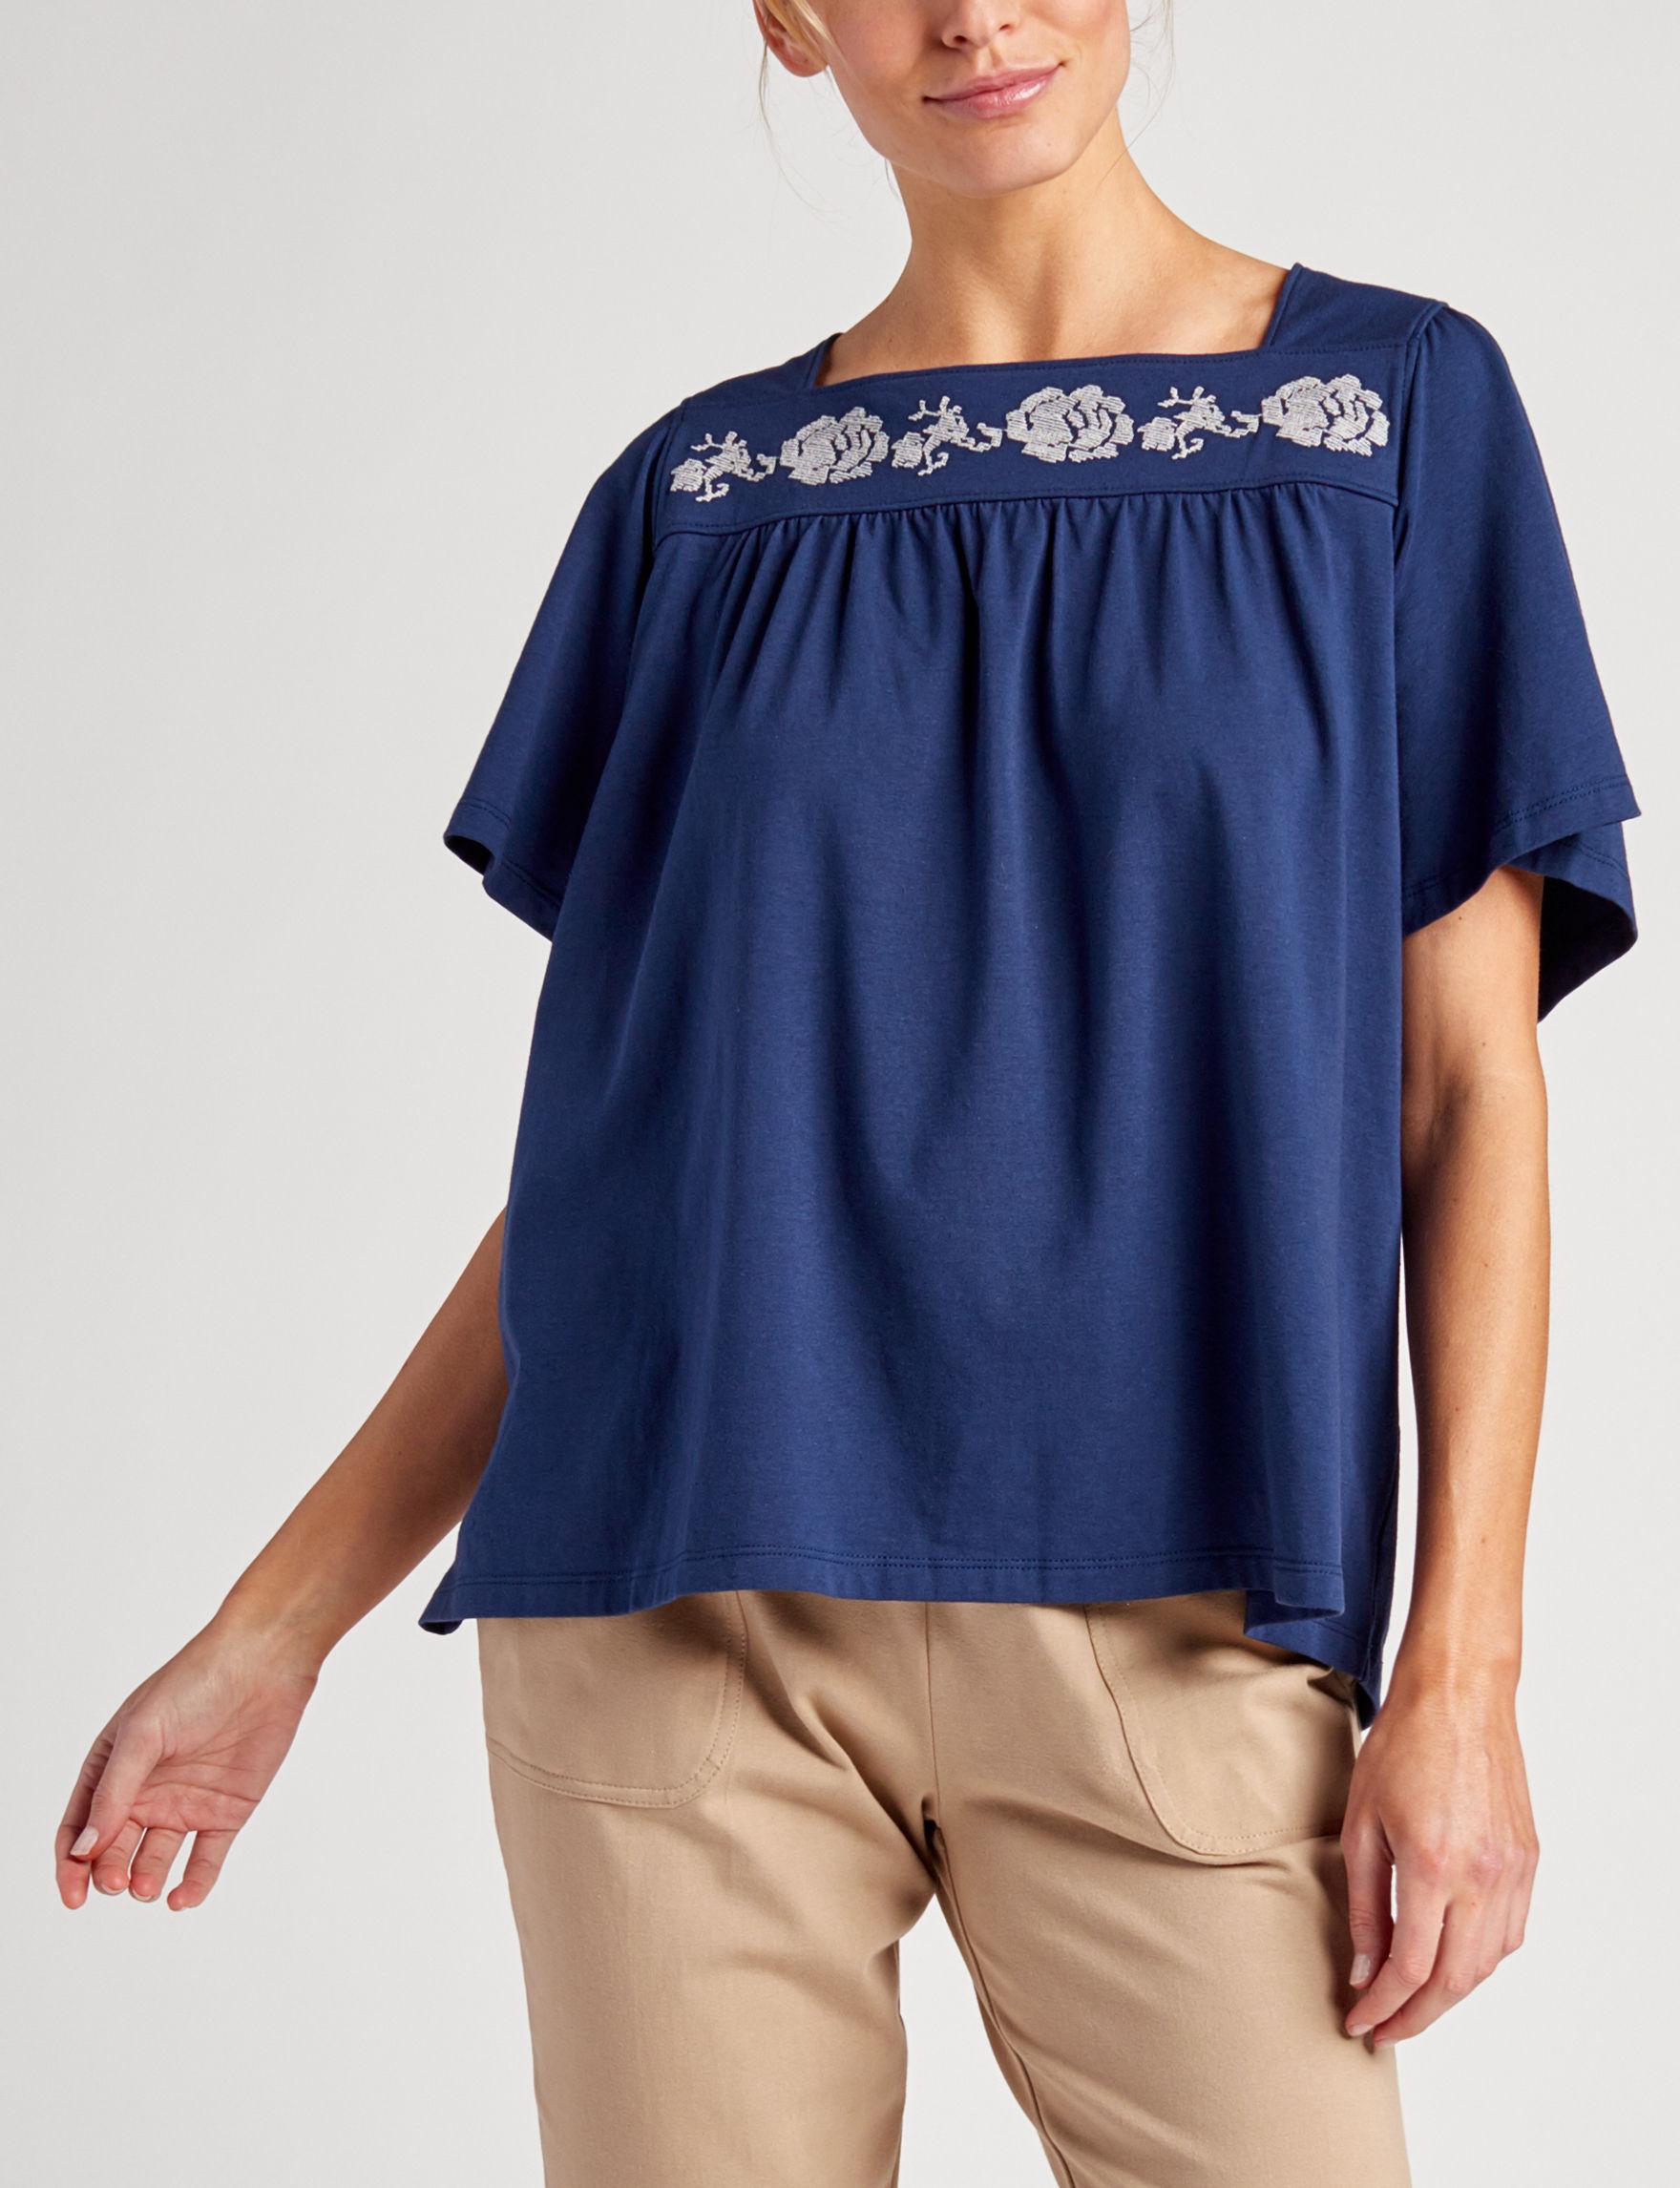 Rebecca Malone Dark Blue Shirts & Blouses